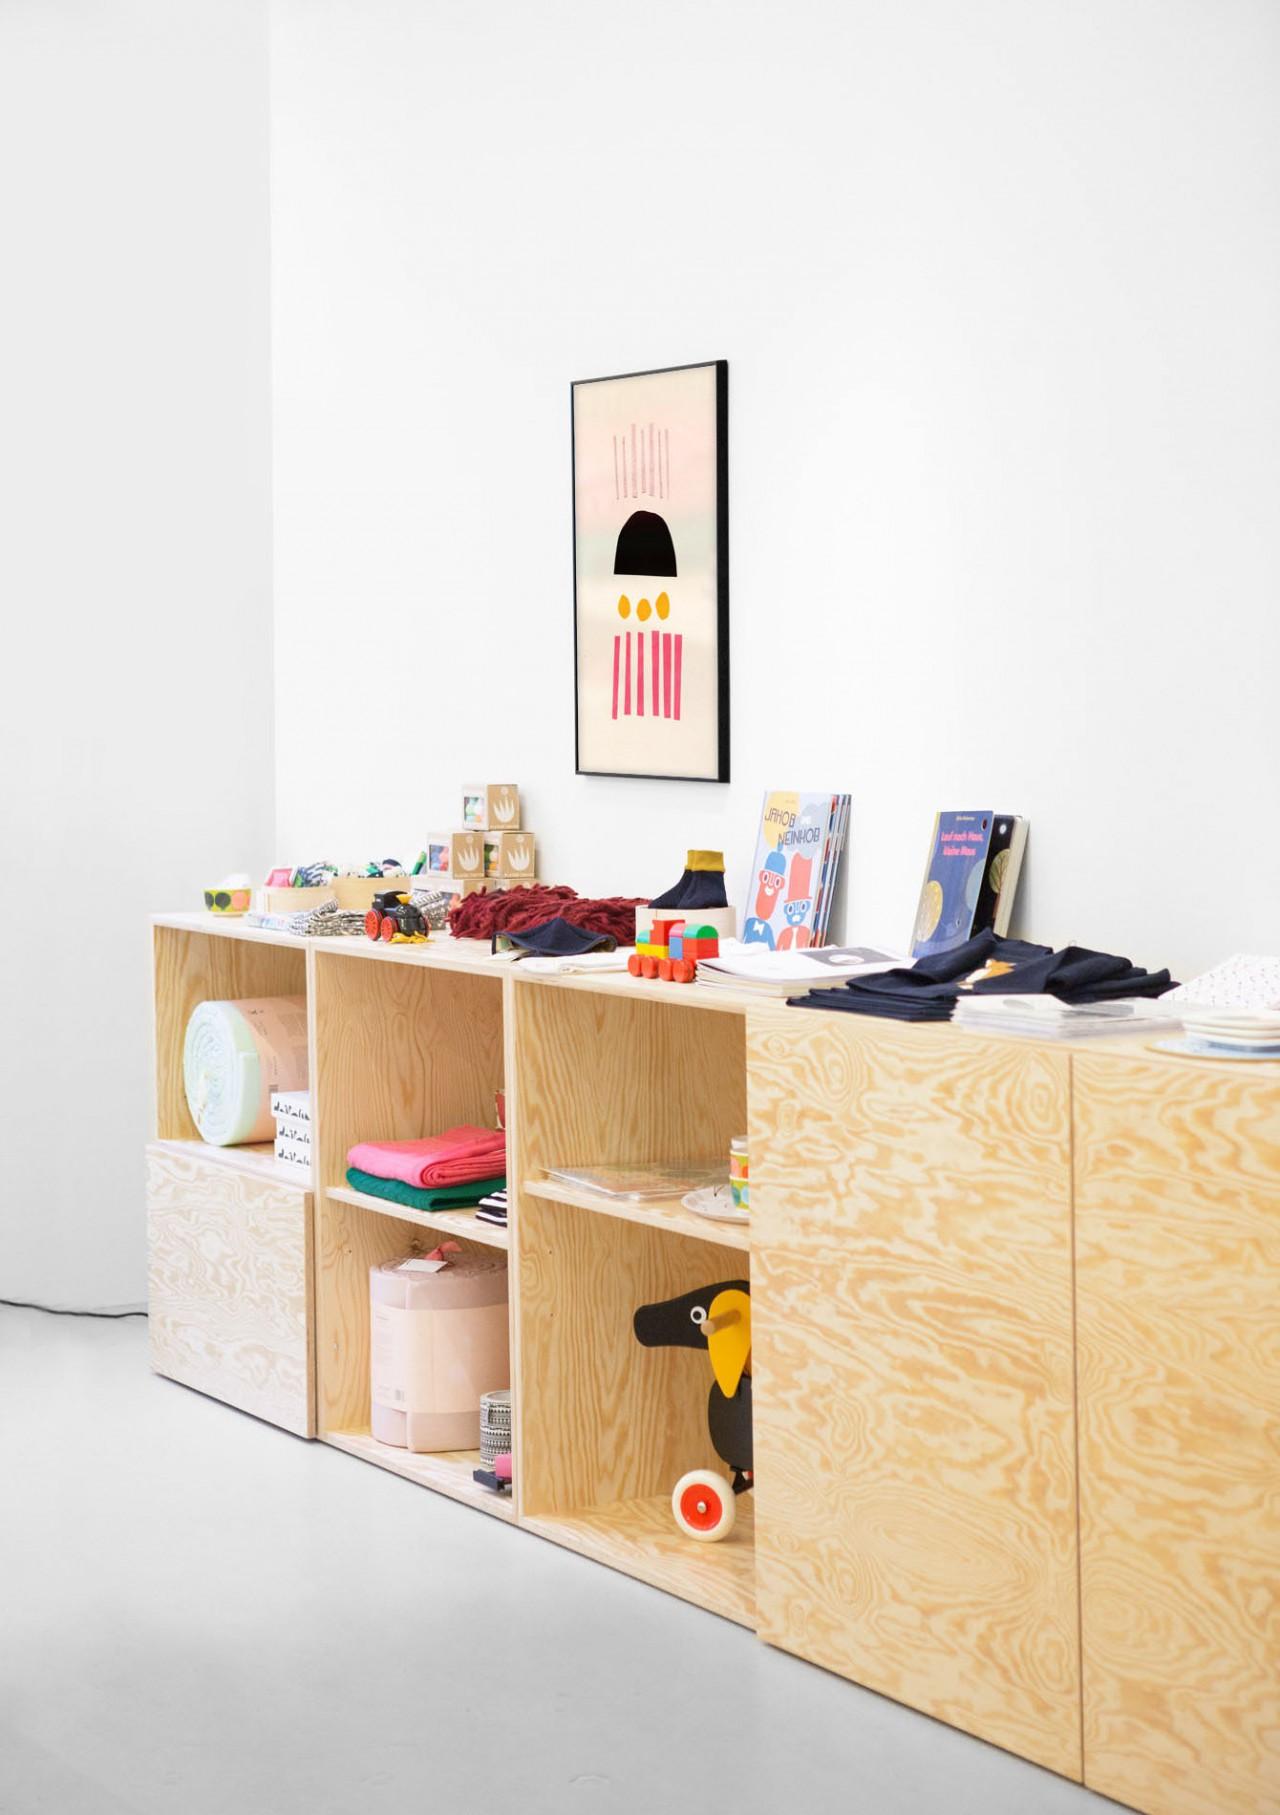 Nadine Goepfert Tiny Store, Interior, 2013